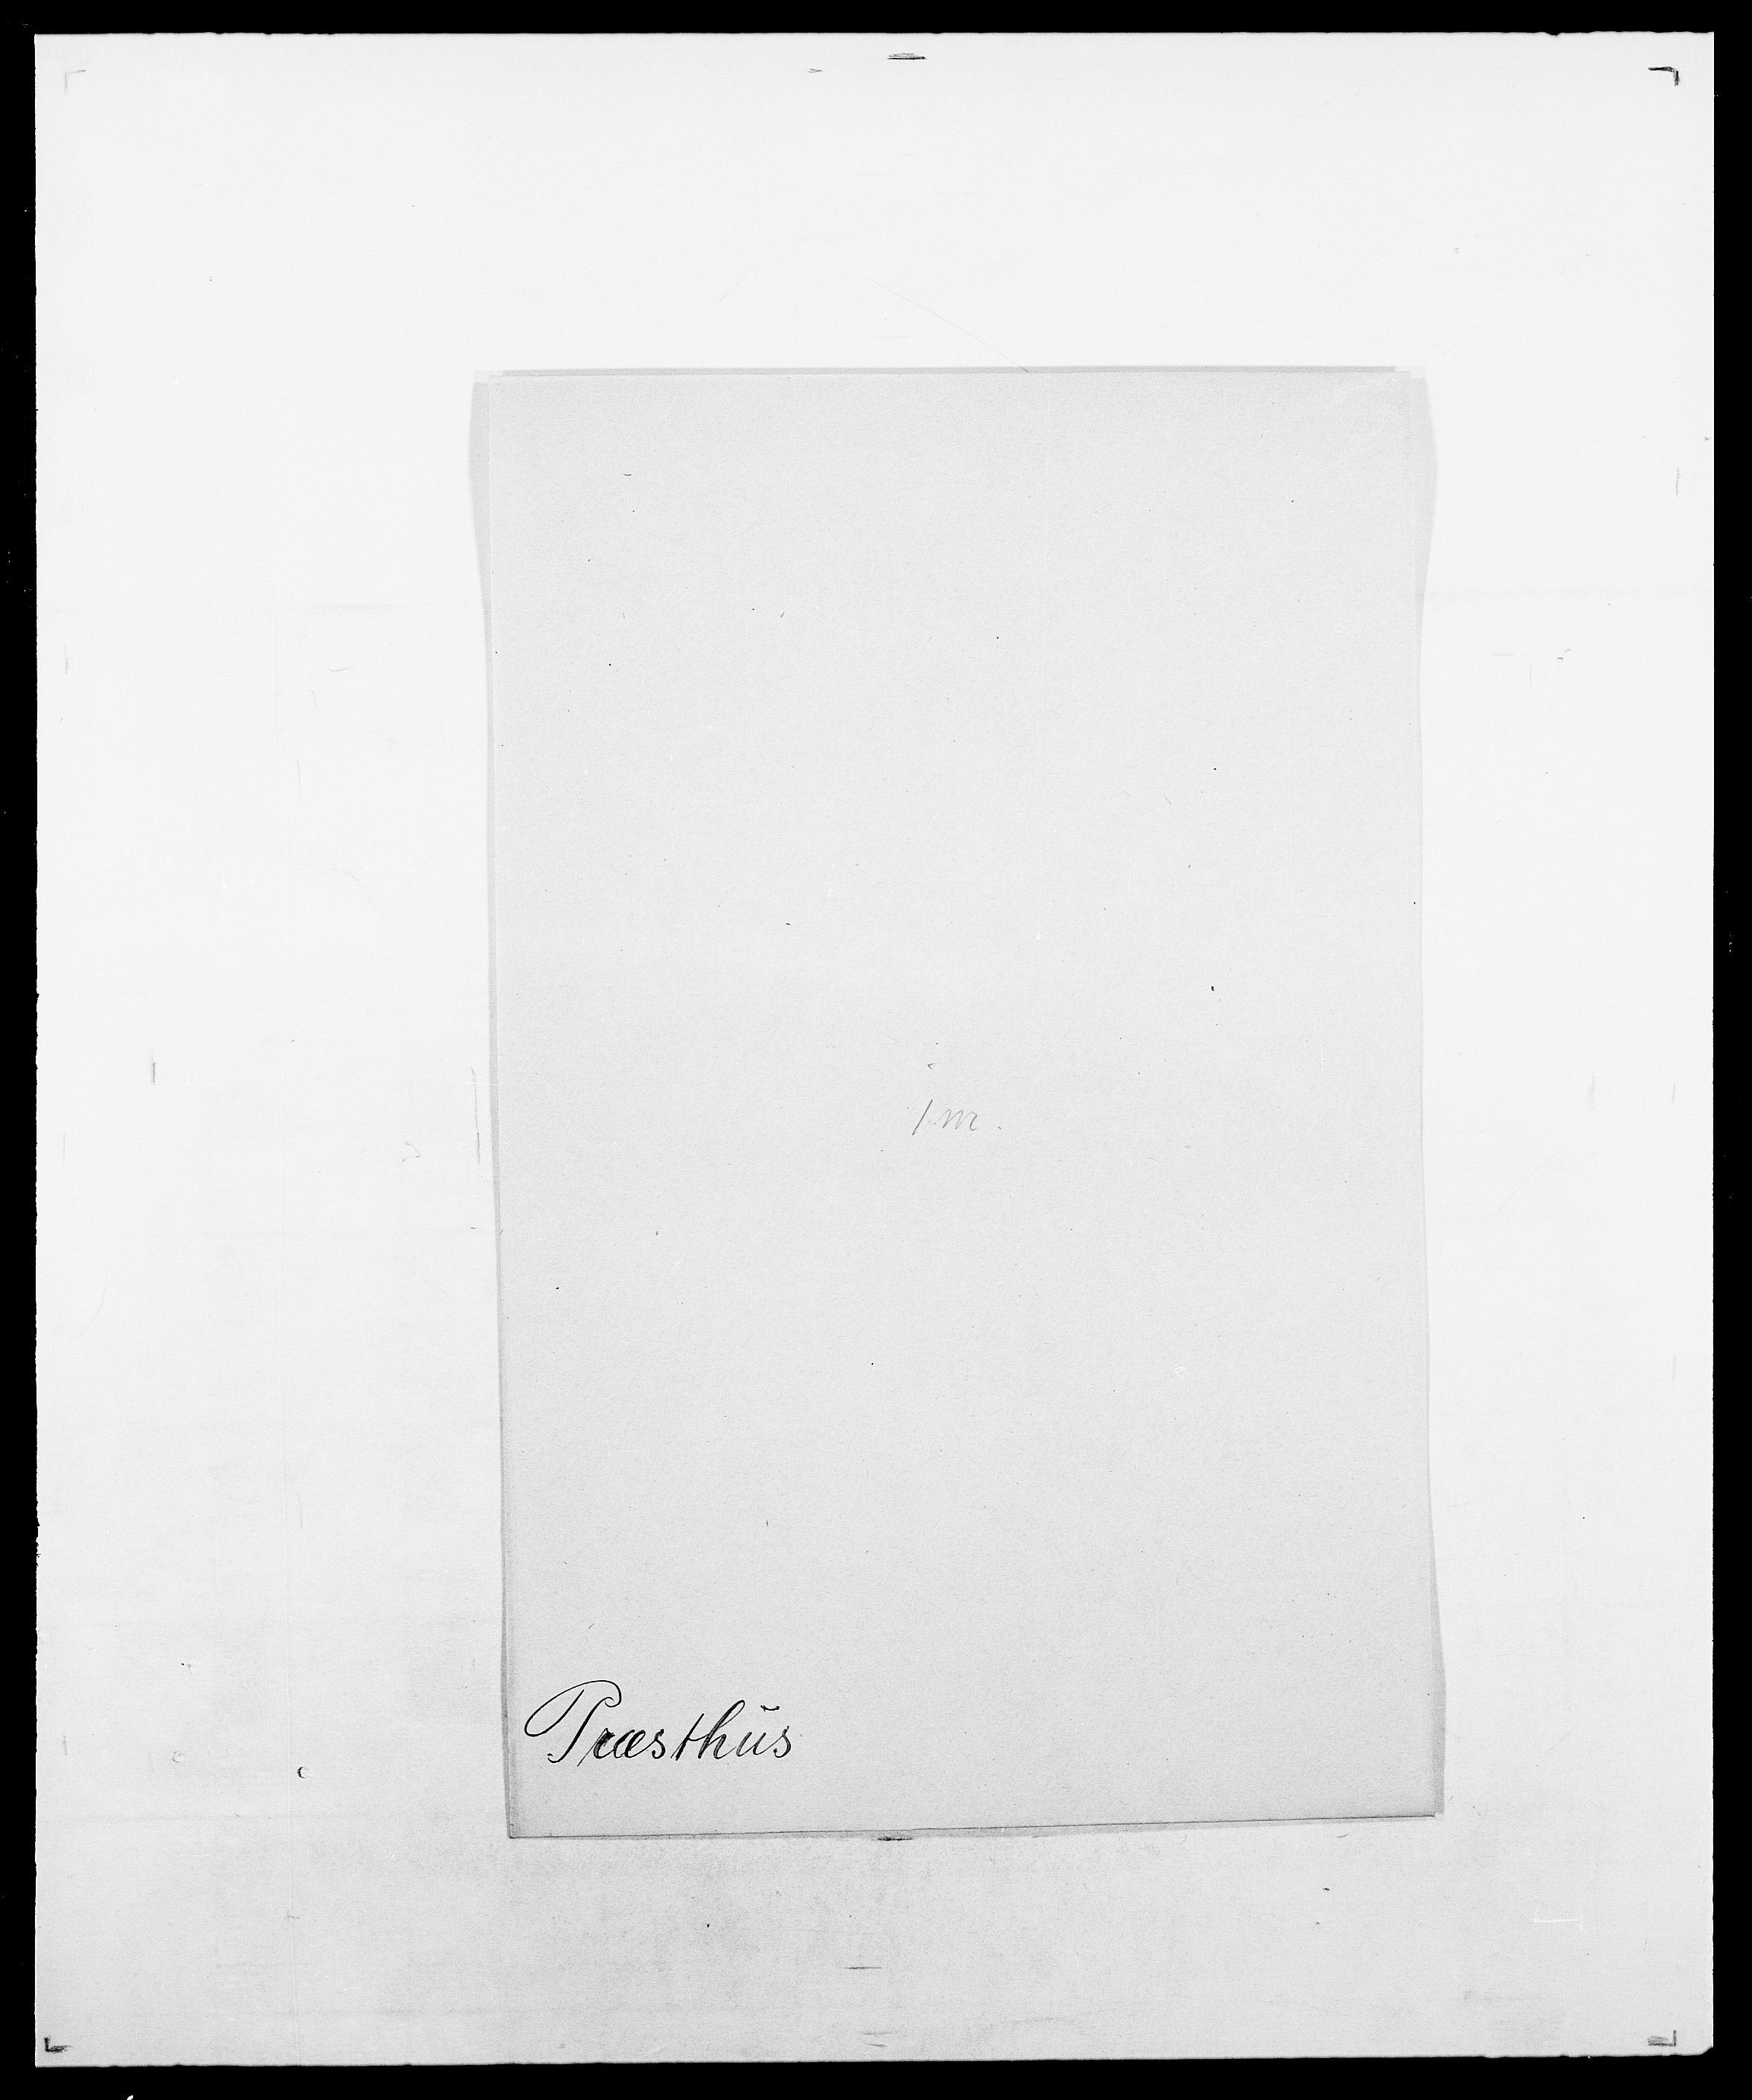 SAO, Delgobe, Charles Antoine - samling, D/Da/L0031: de Place - Raaum, s. 404